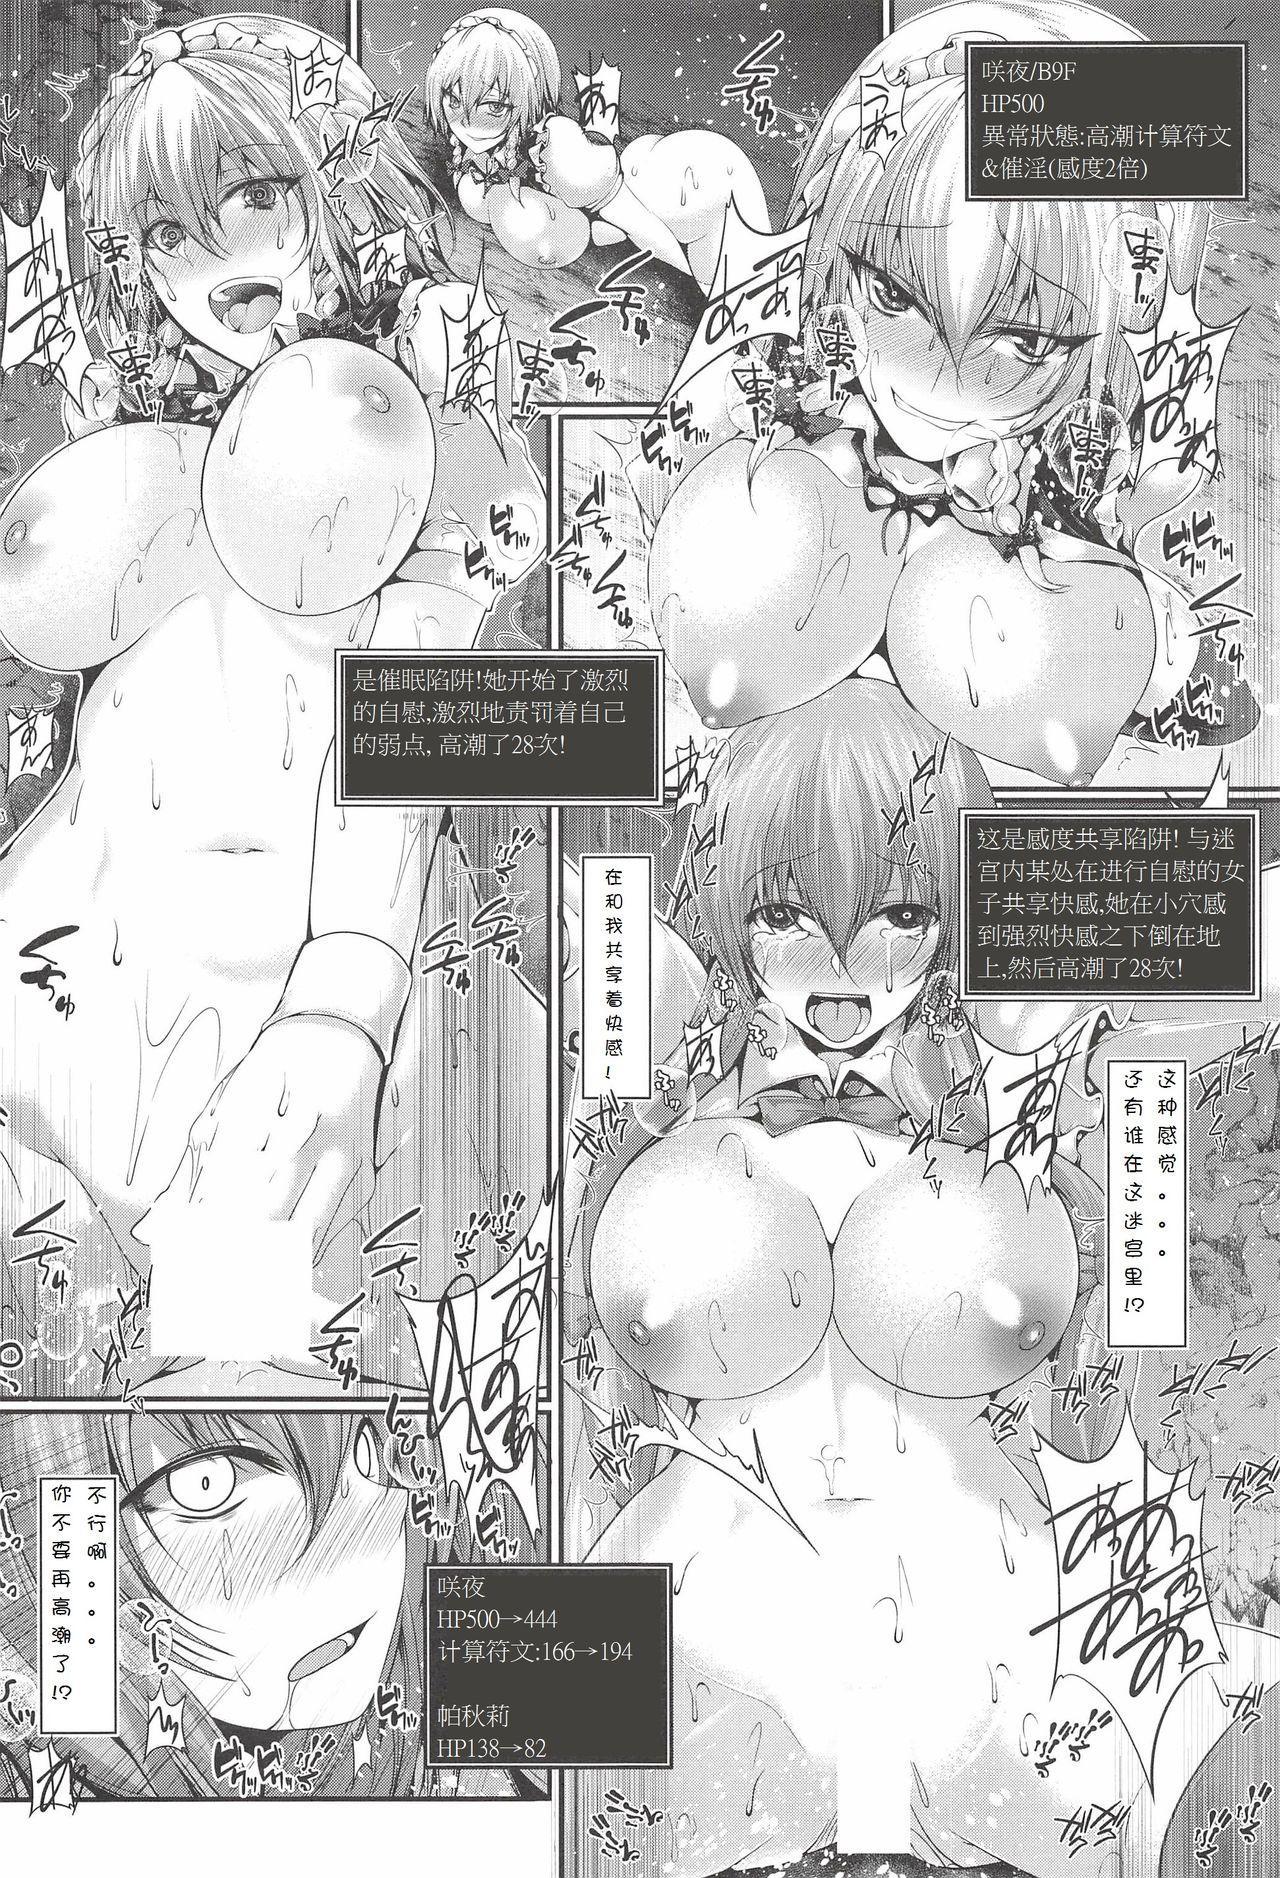 Sakuya-san Tachi no Ero Trap Dungeon 15